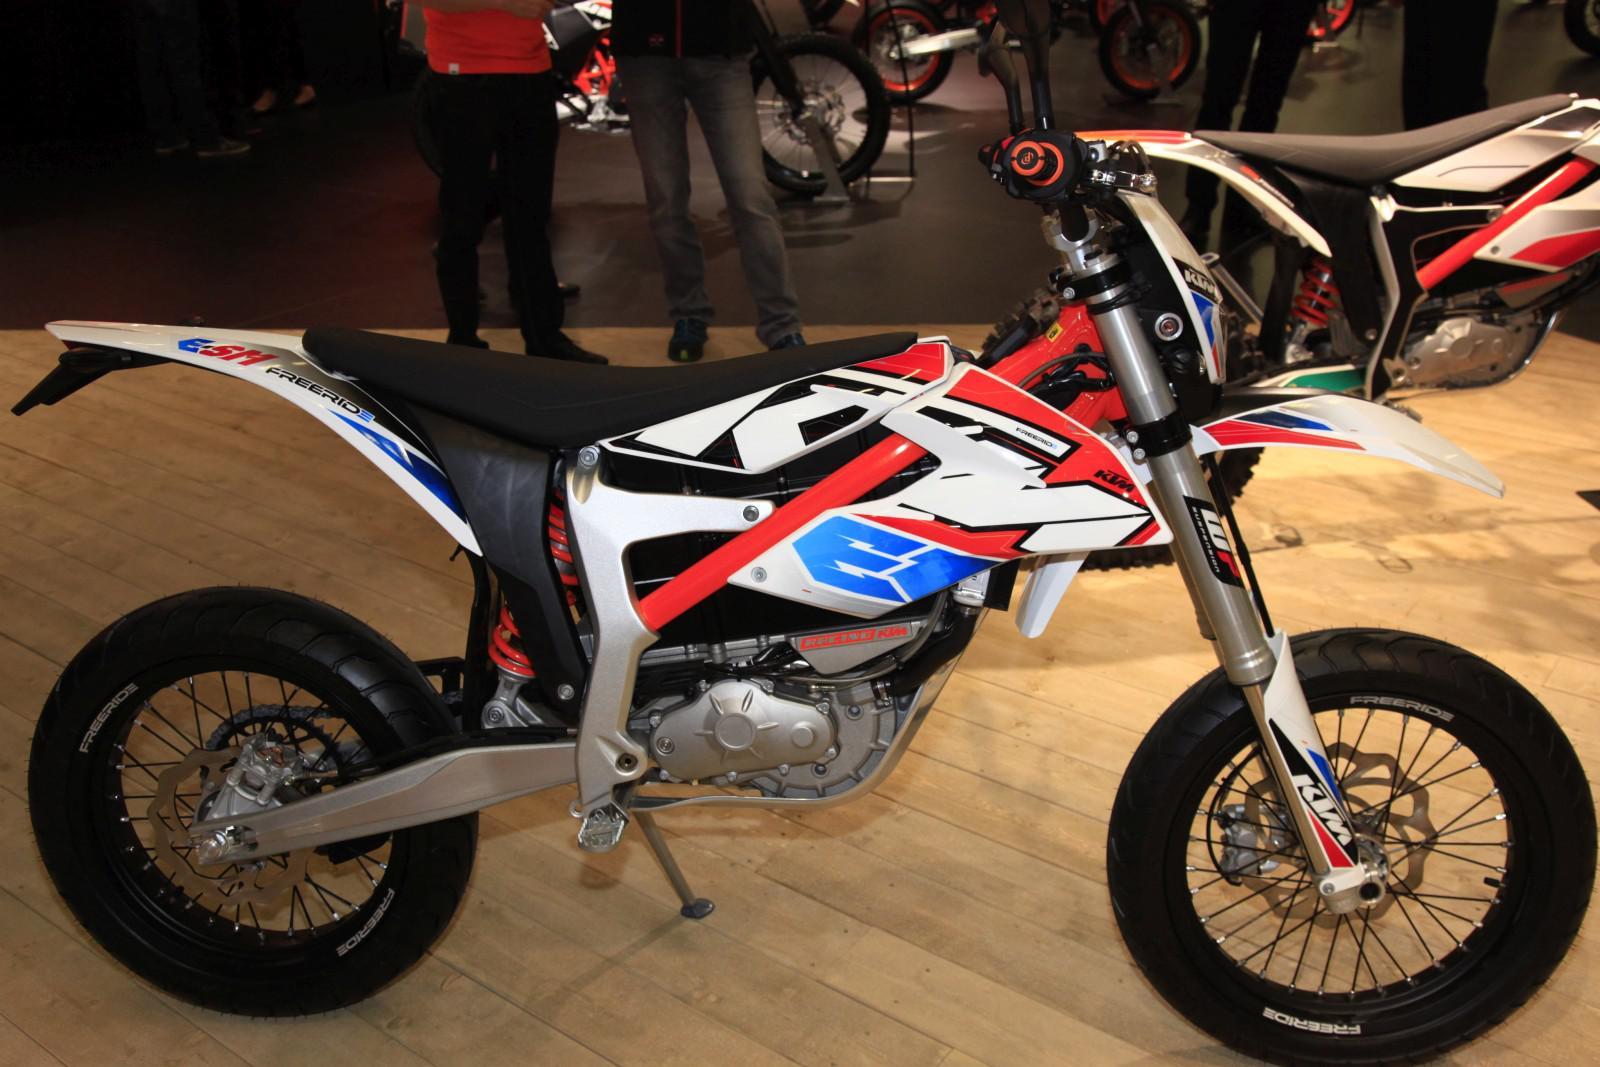 Ktm Freeride E Sm >> KTM Freeride E-SM 2015 Motorrad Fotos & Motorrad Bilder